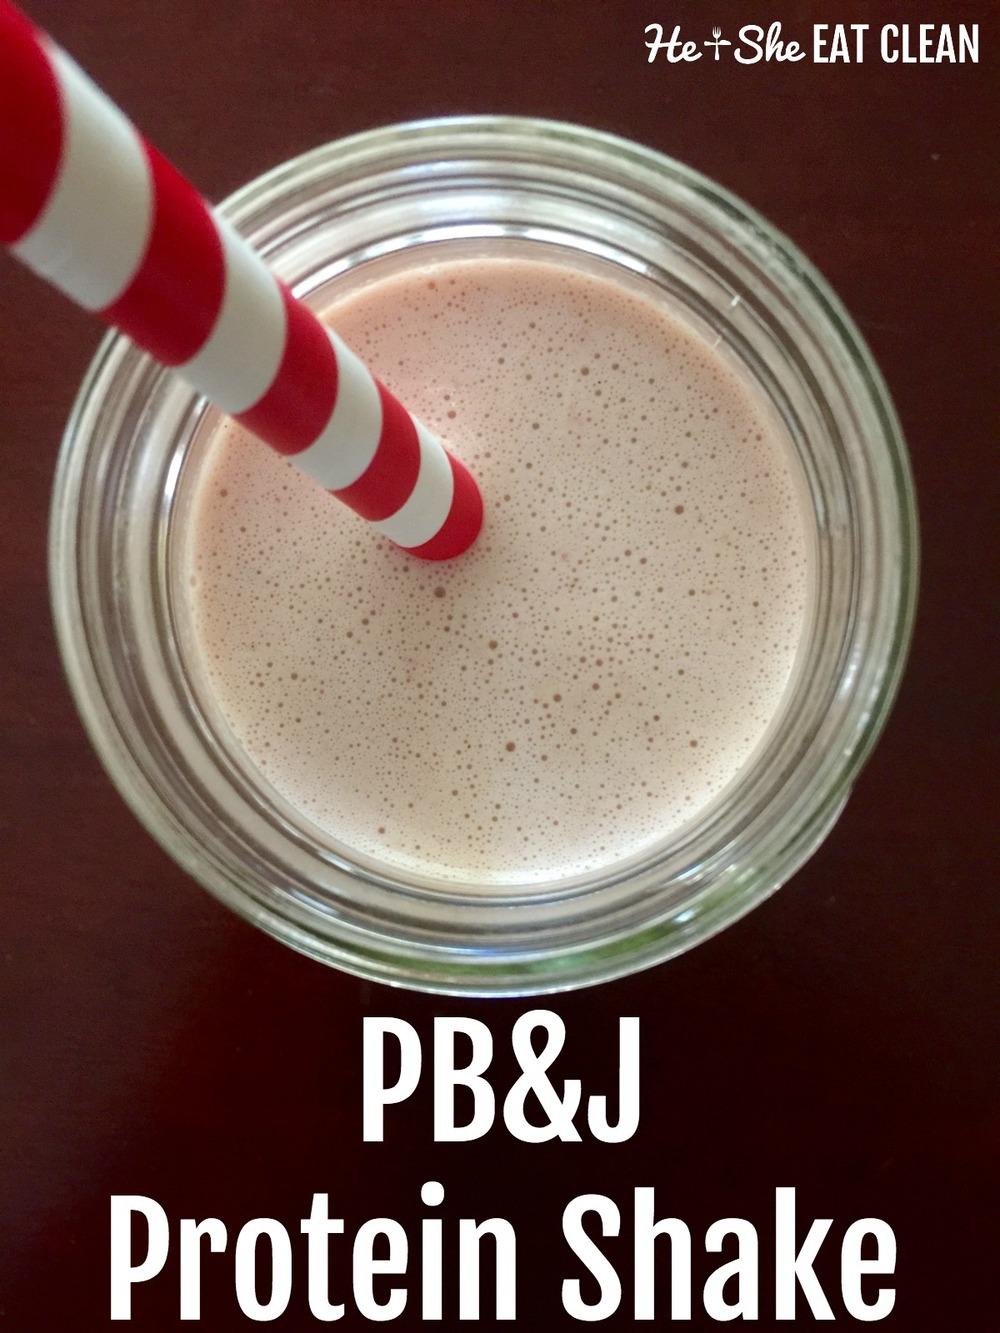 Clean Eat Recipe: PB&J Protein Shake